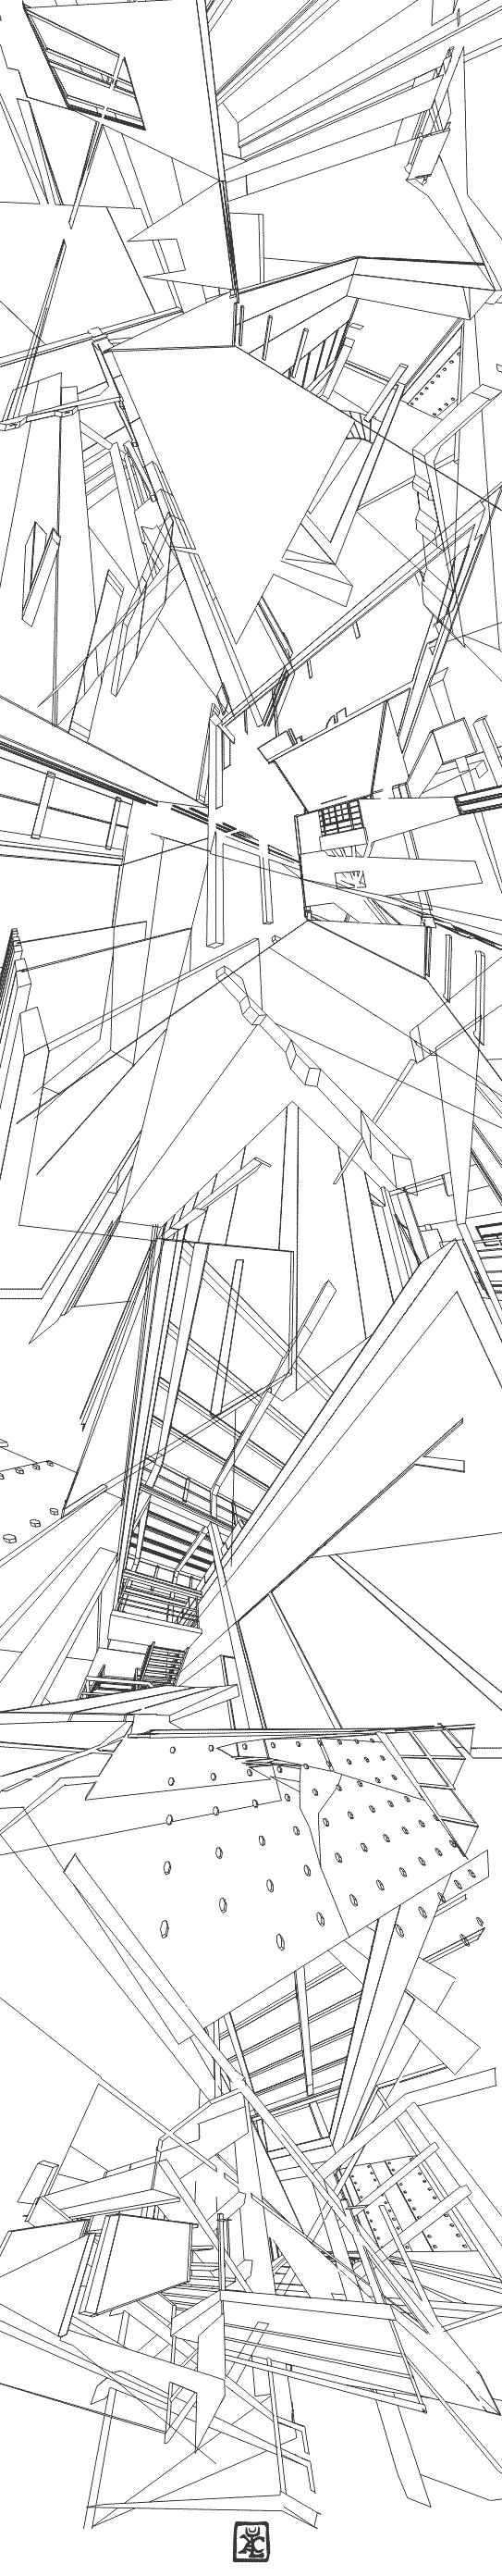 Architectural Deconstruction by KatayClysm